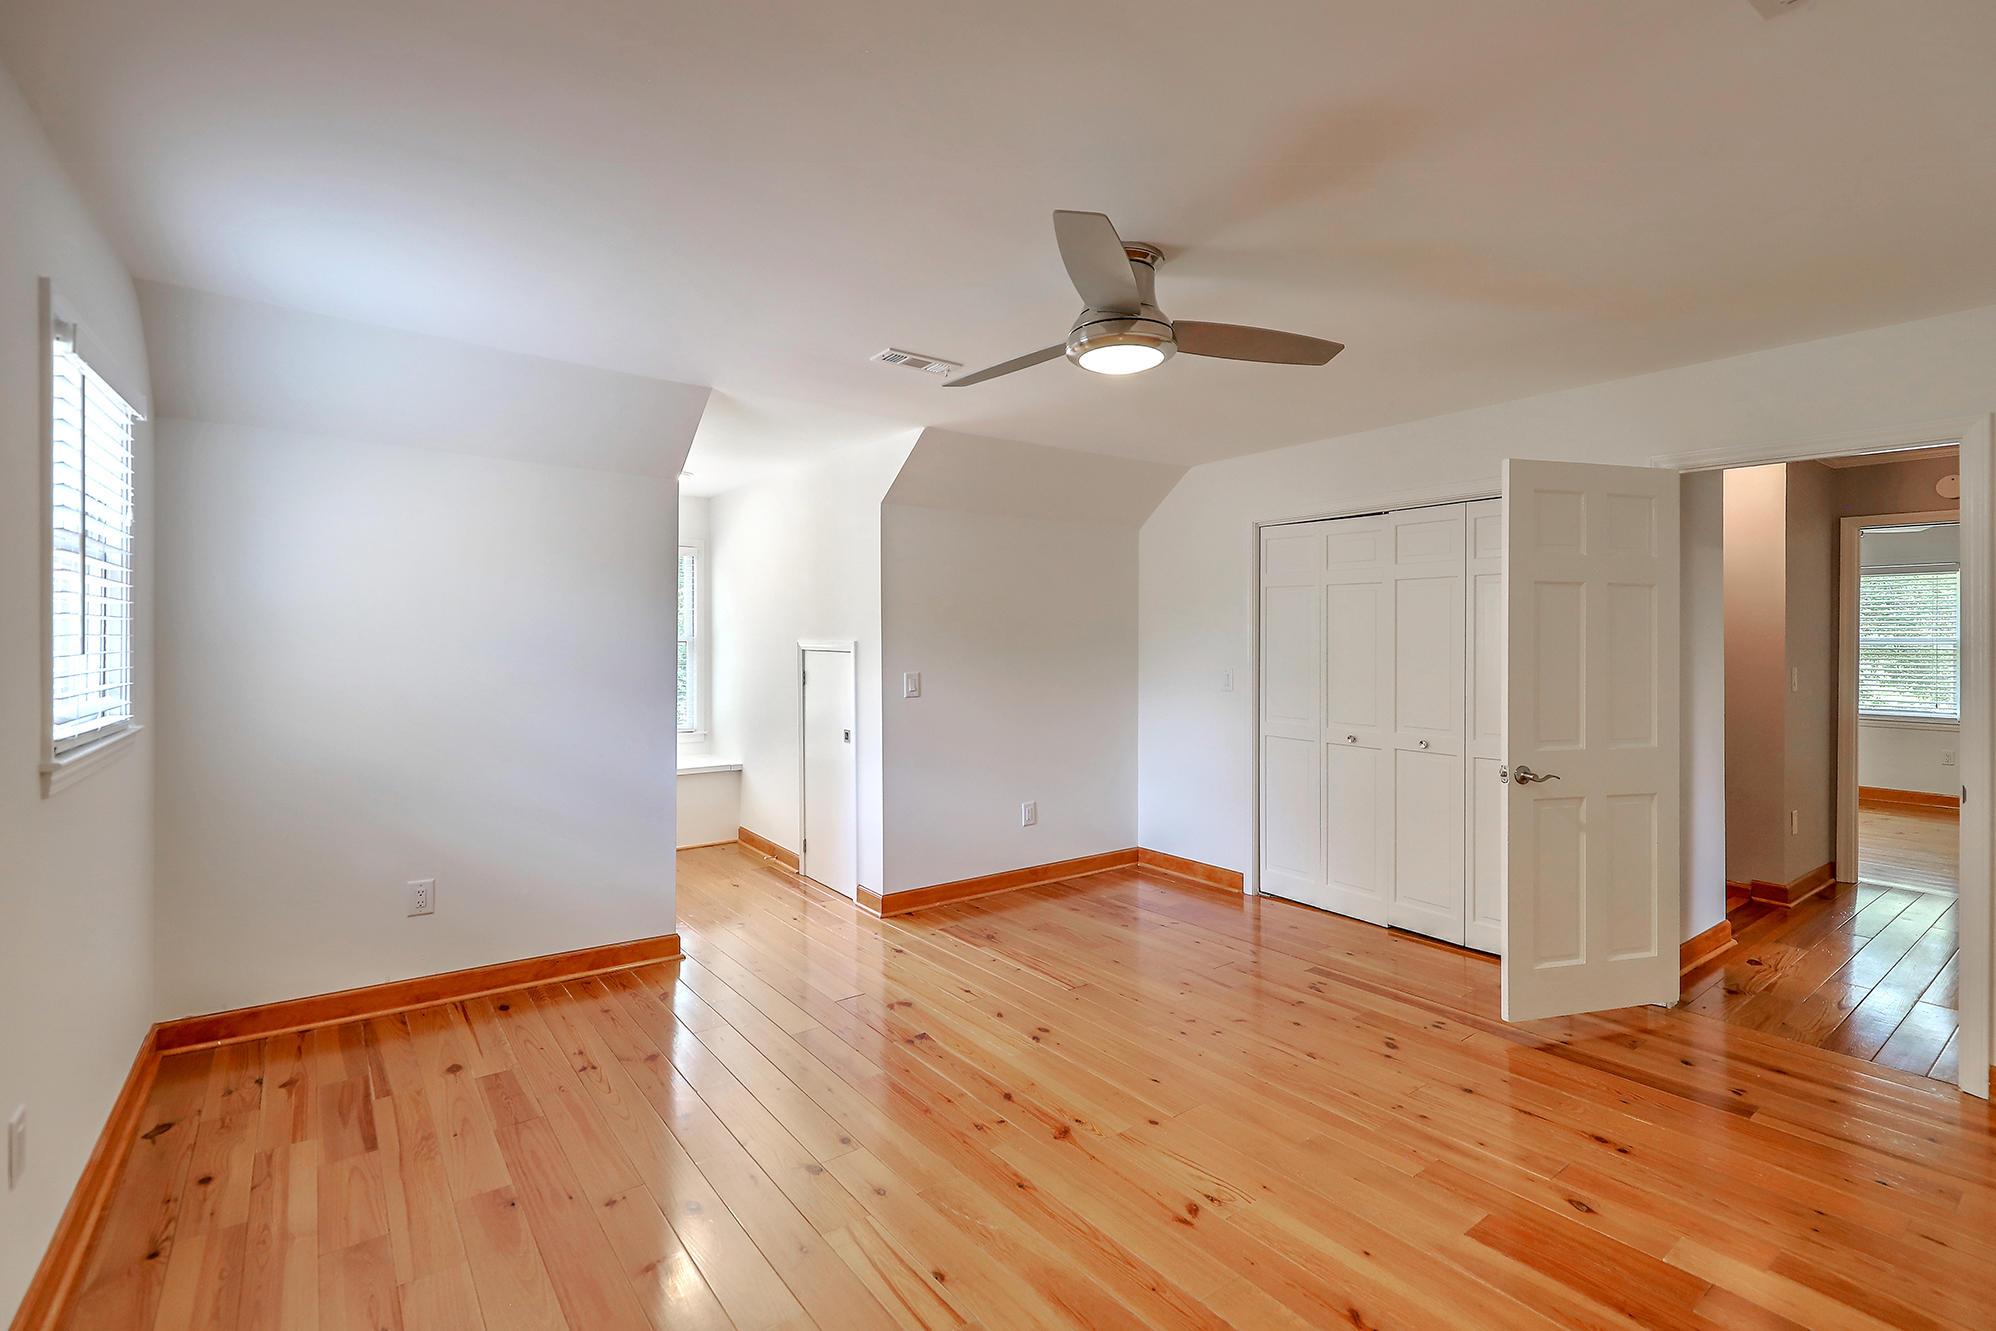 Edgewater Park Homes For Sale - 1413 Edsent, Charleston, SC - 19